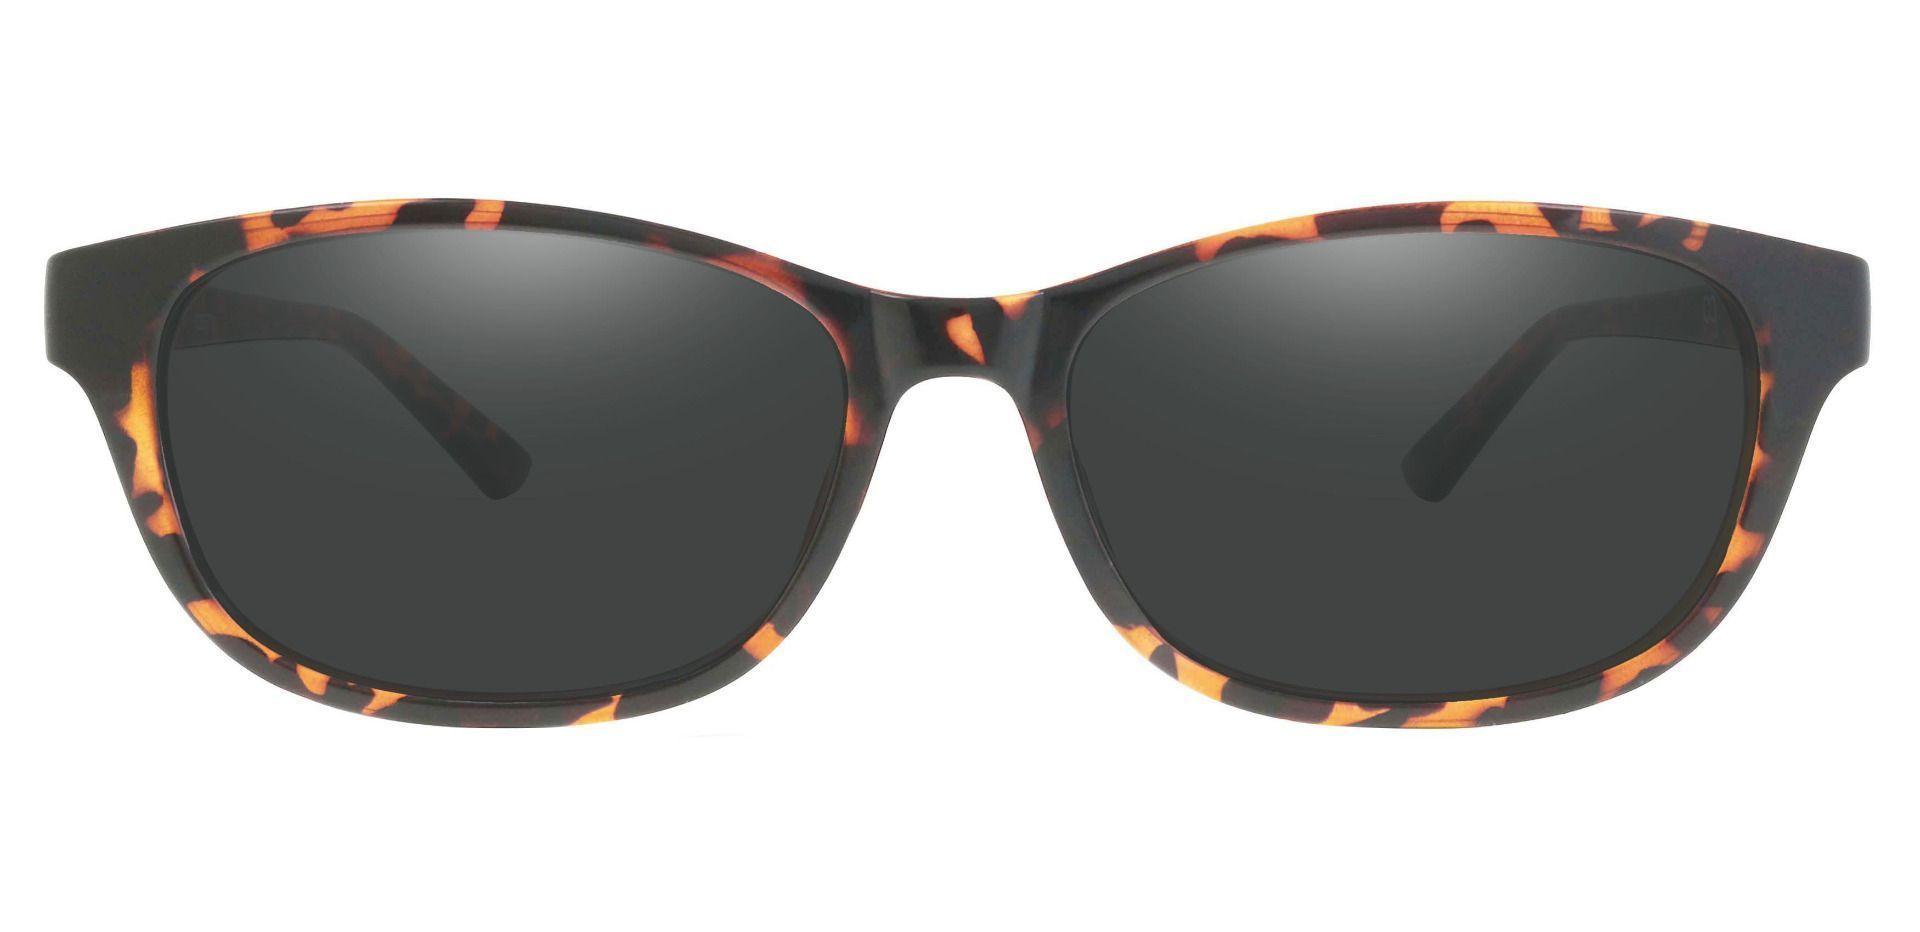 Reyna Classic Square Progressive Sunglasses - Tortoise Frame With Gray Lenses